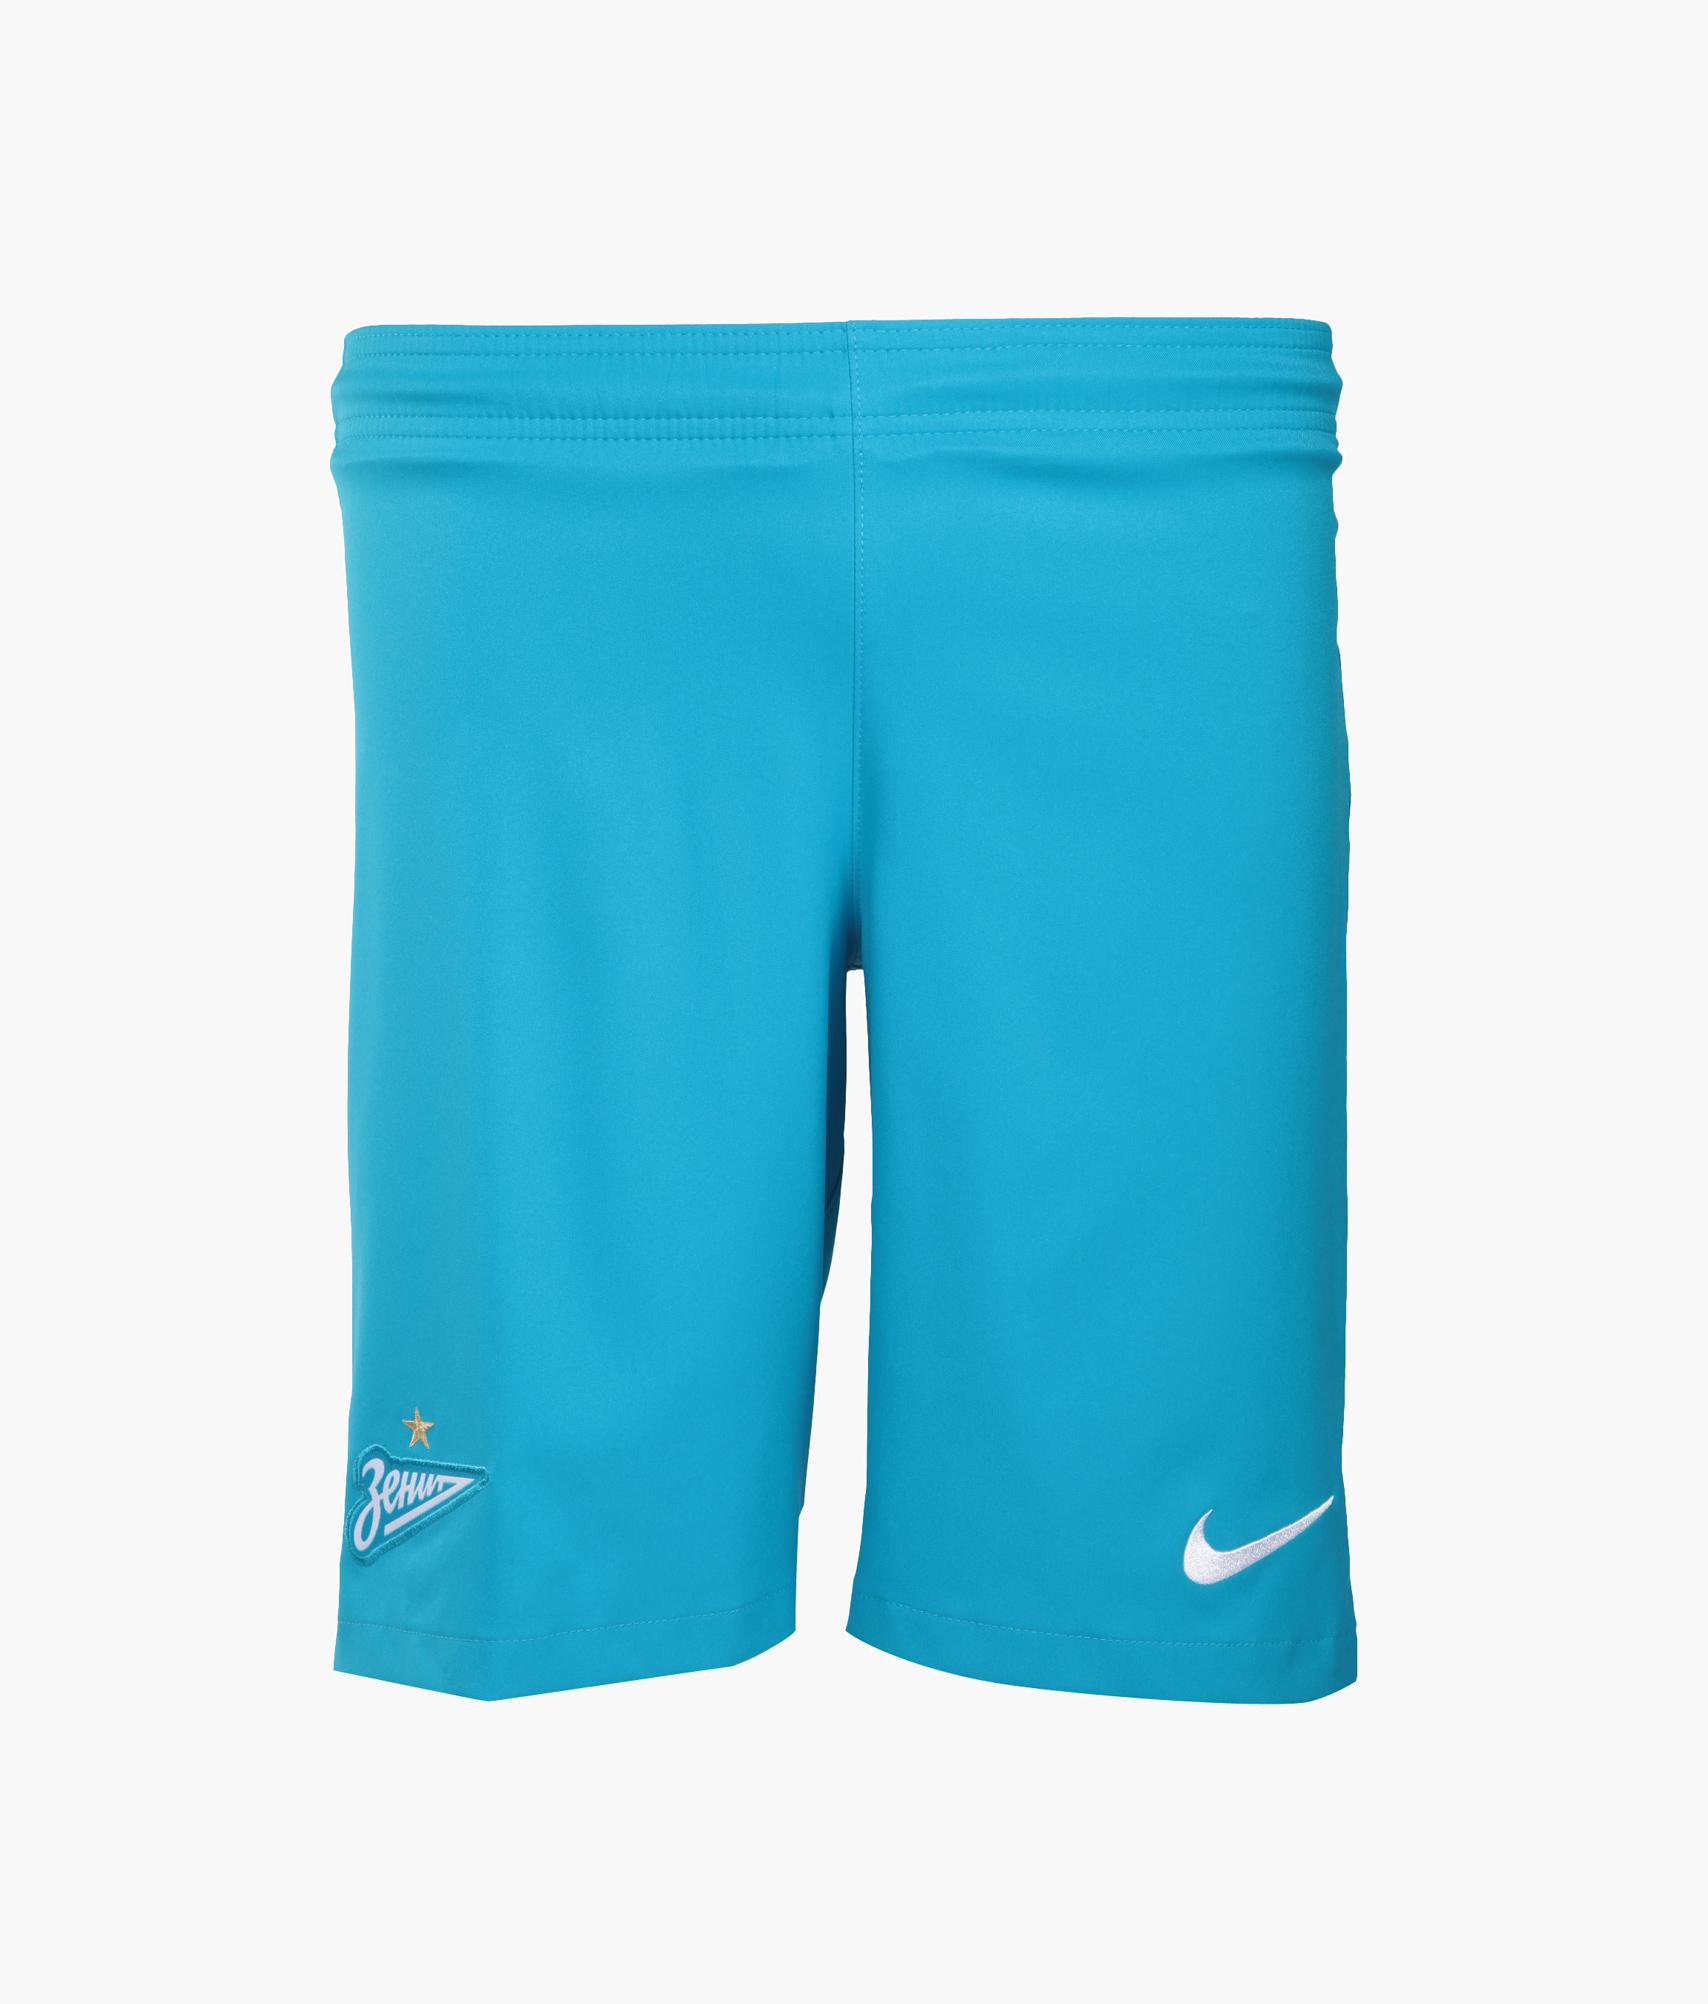 Шорты домашние Nike Nike Цвет-Синий comazo шорты домашние